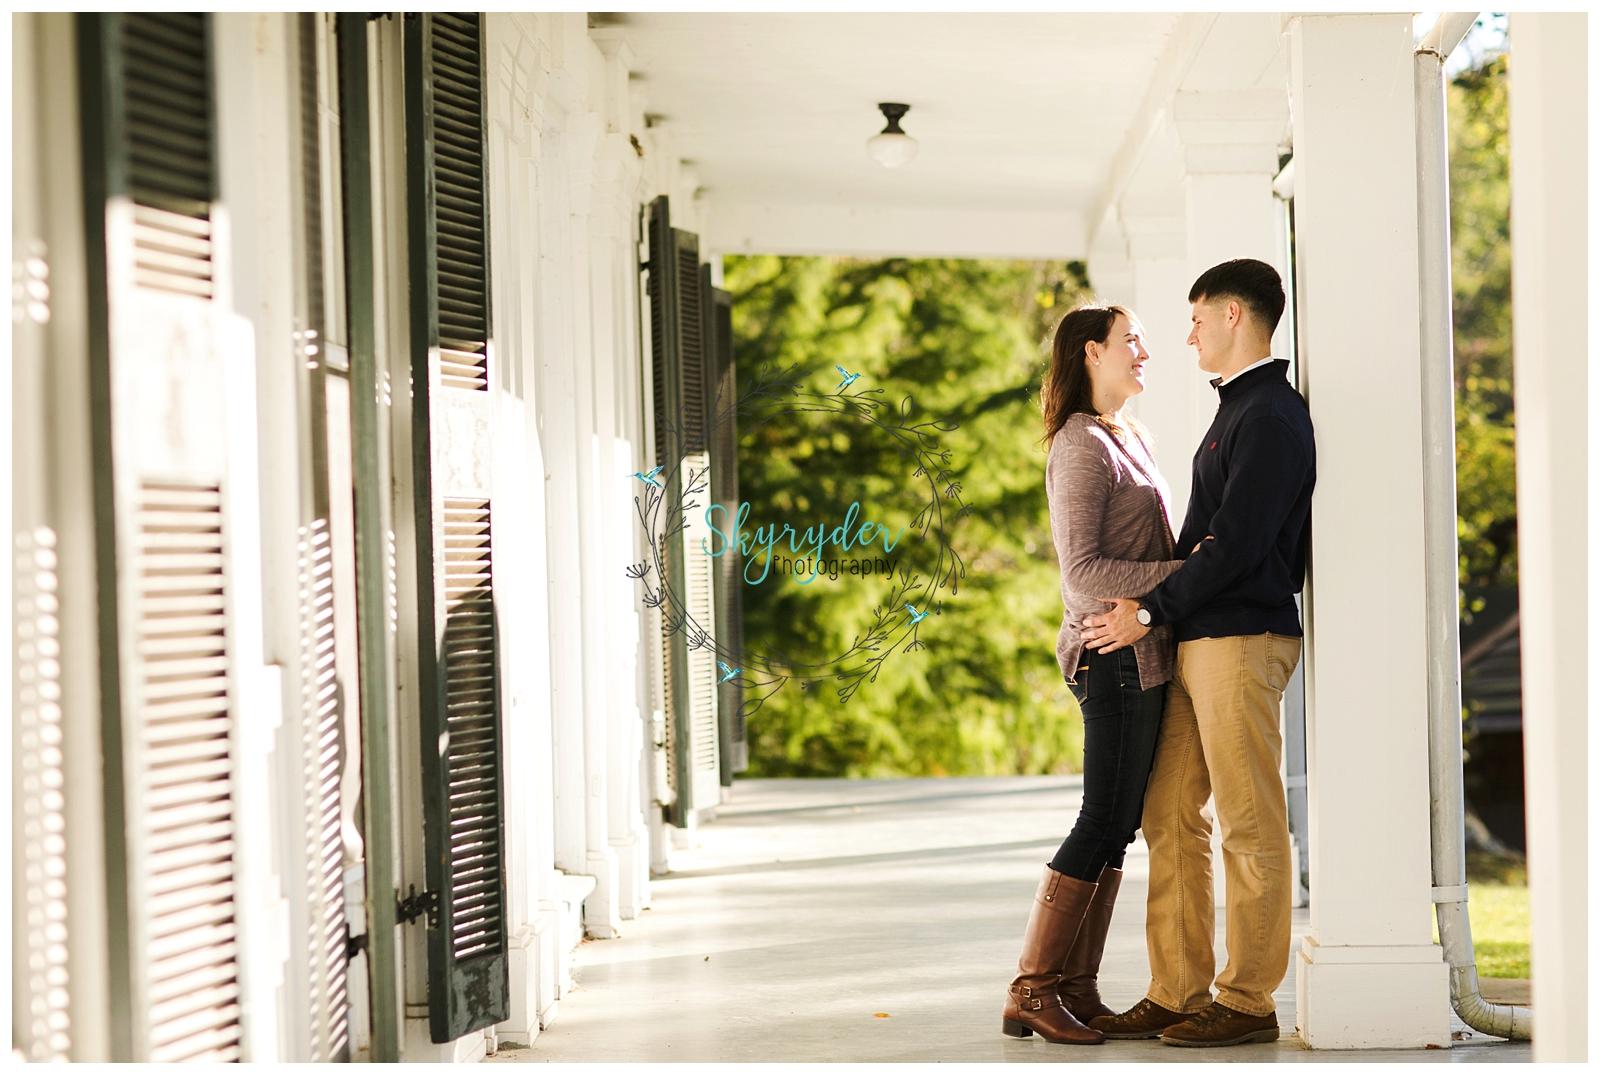 skyryder Blacksburg engagement wedding photographer session roanoke virginia tech vt